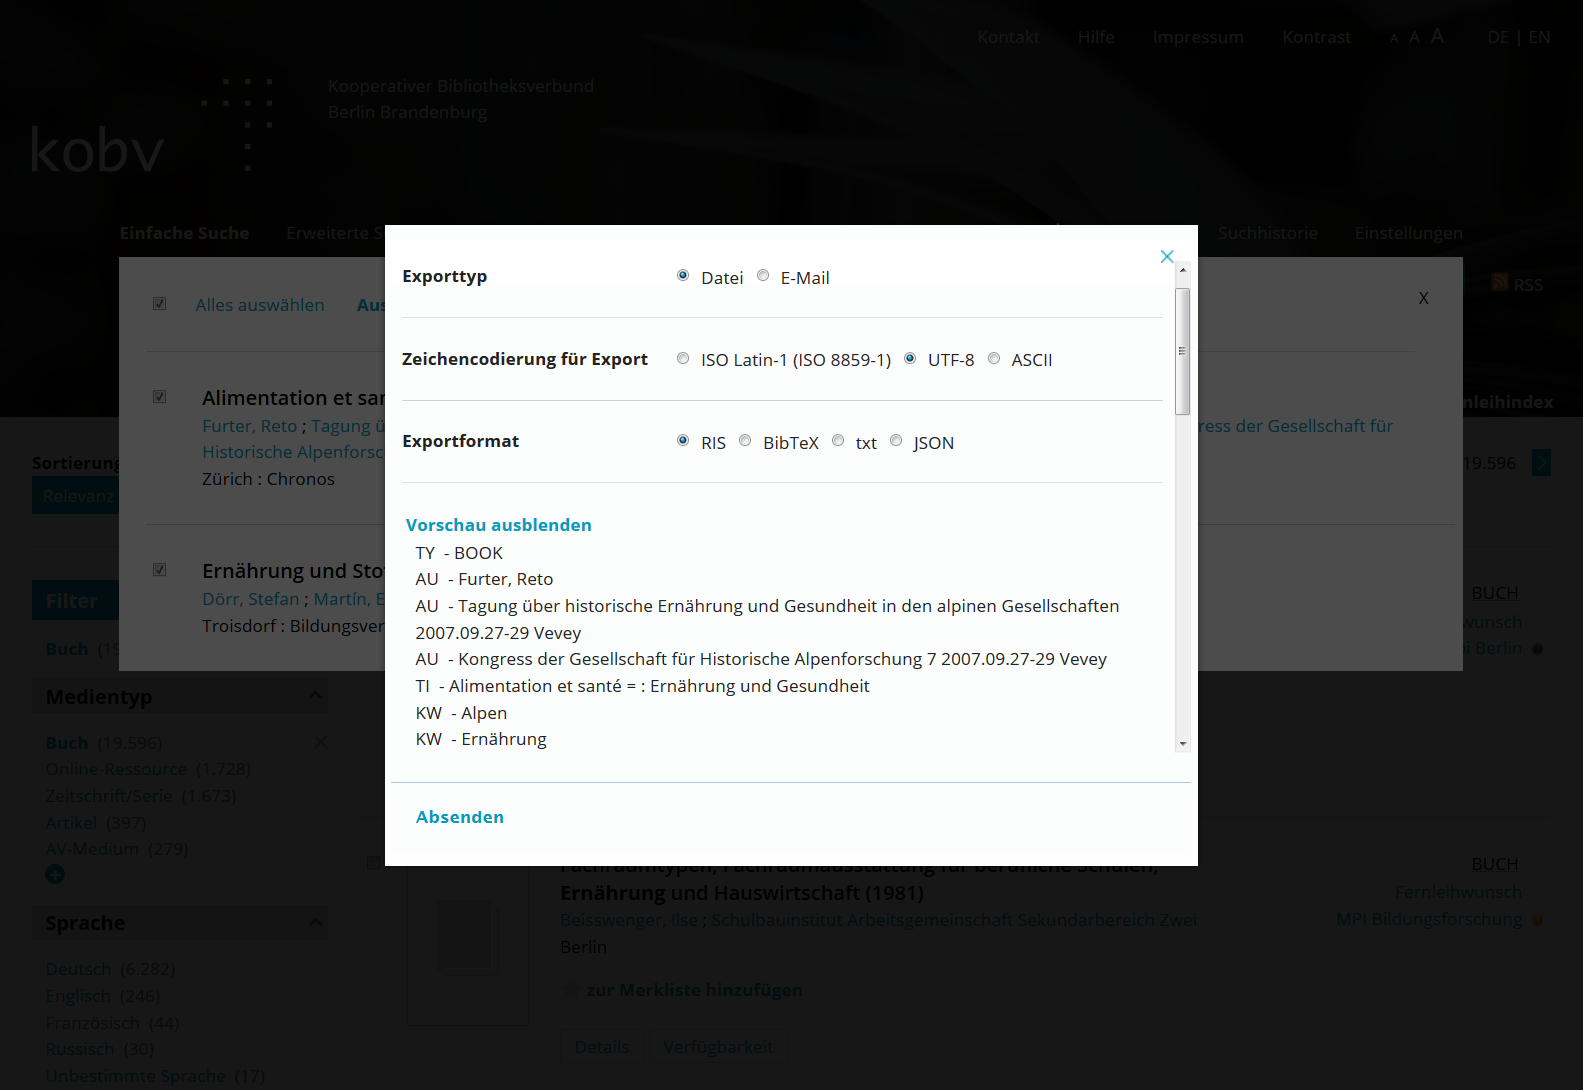 KOBV Portal_Exportvorschau